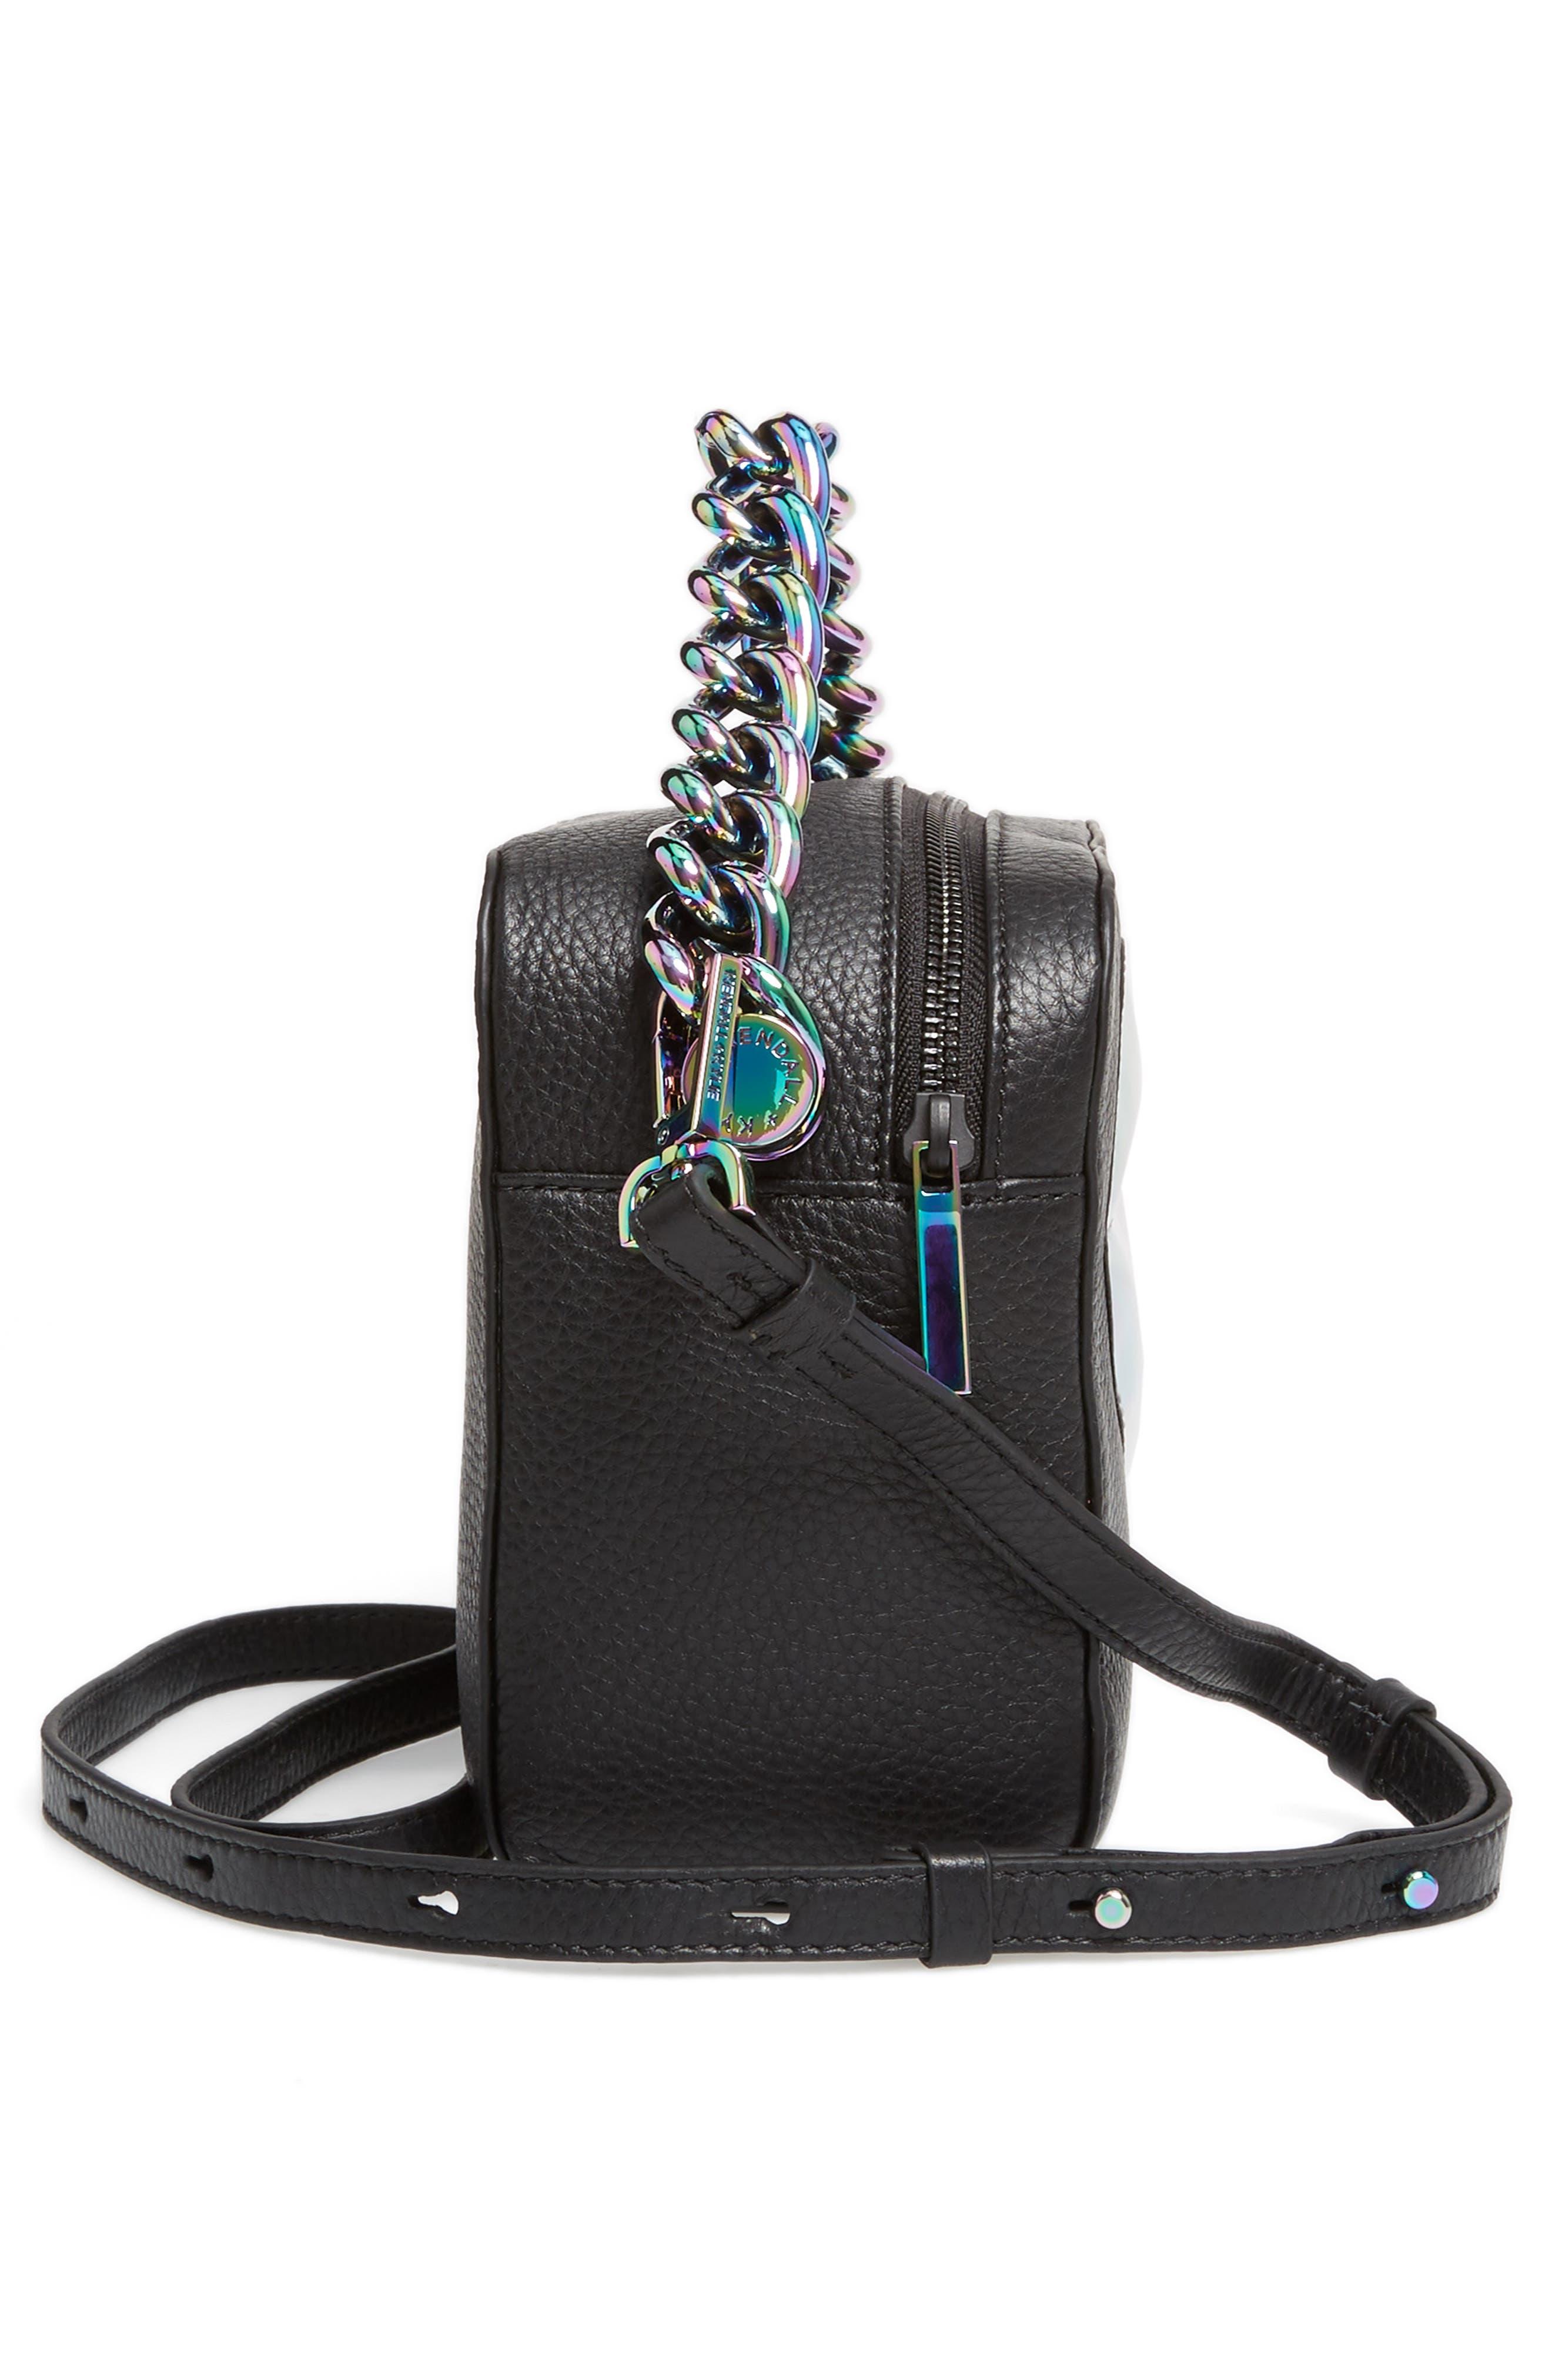 Lucy Lips Crossbody Bag,                             Alternate thumbnail 4, color,                             Black